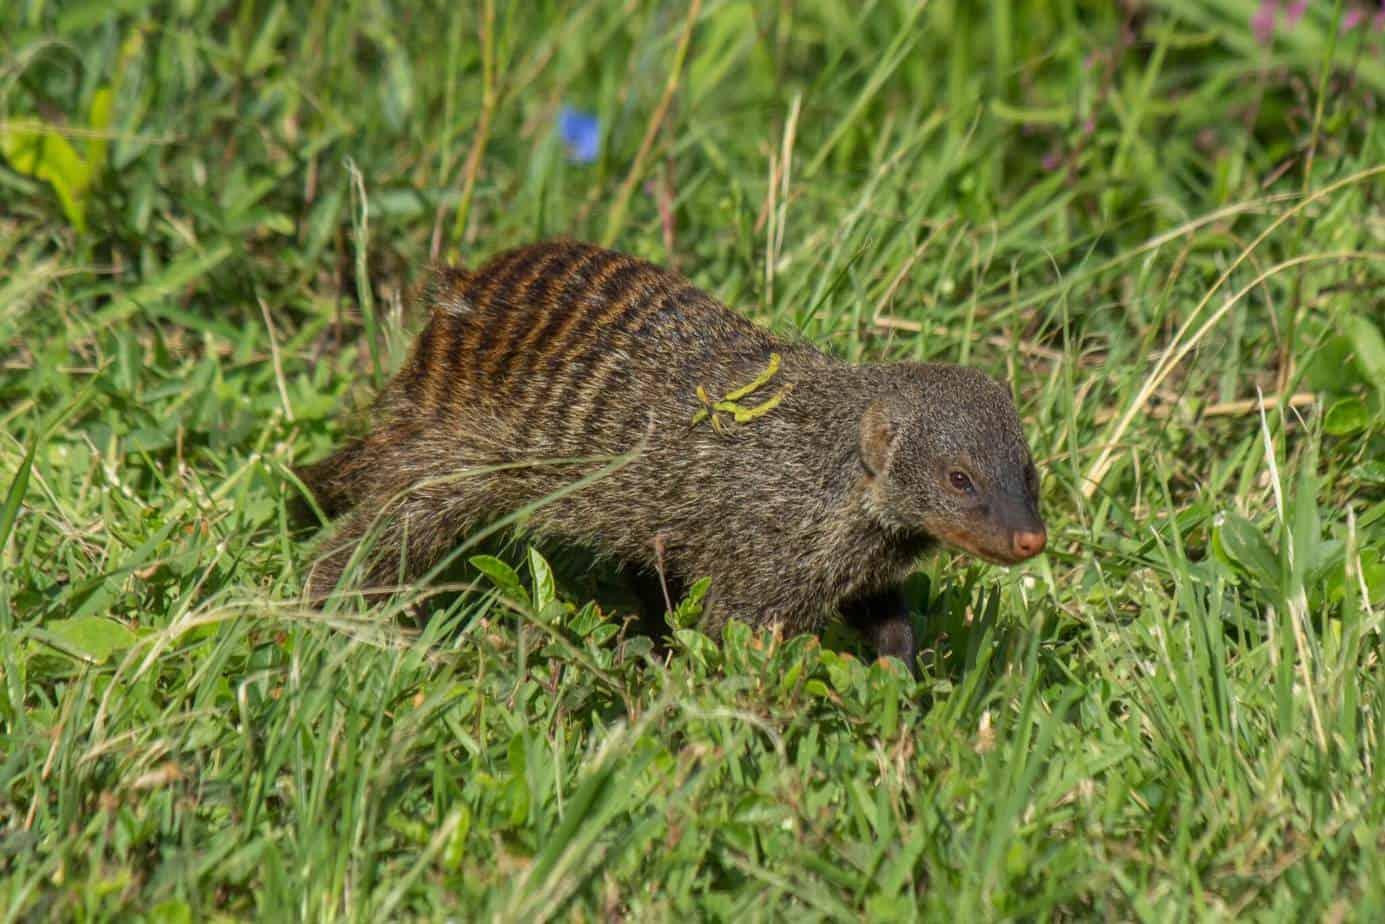 Banded Mongoose @ Eastern Shores - iSimangaliso Wetland Park. Photo: Håvard Rosenlund